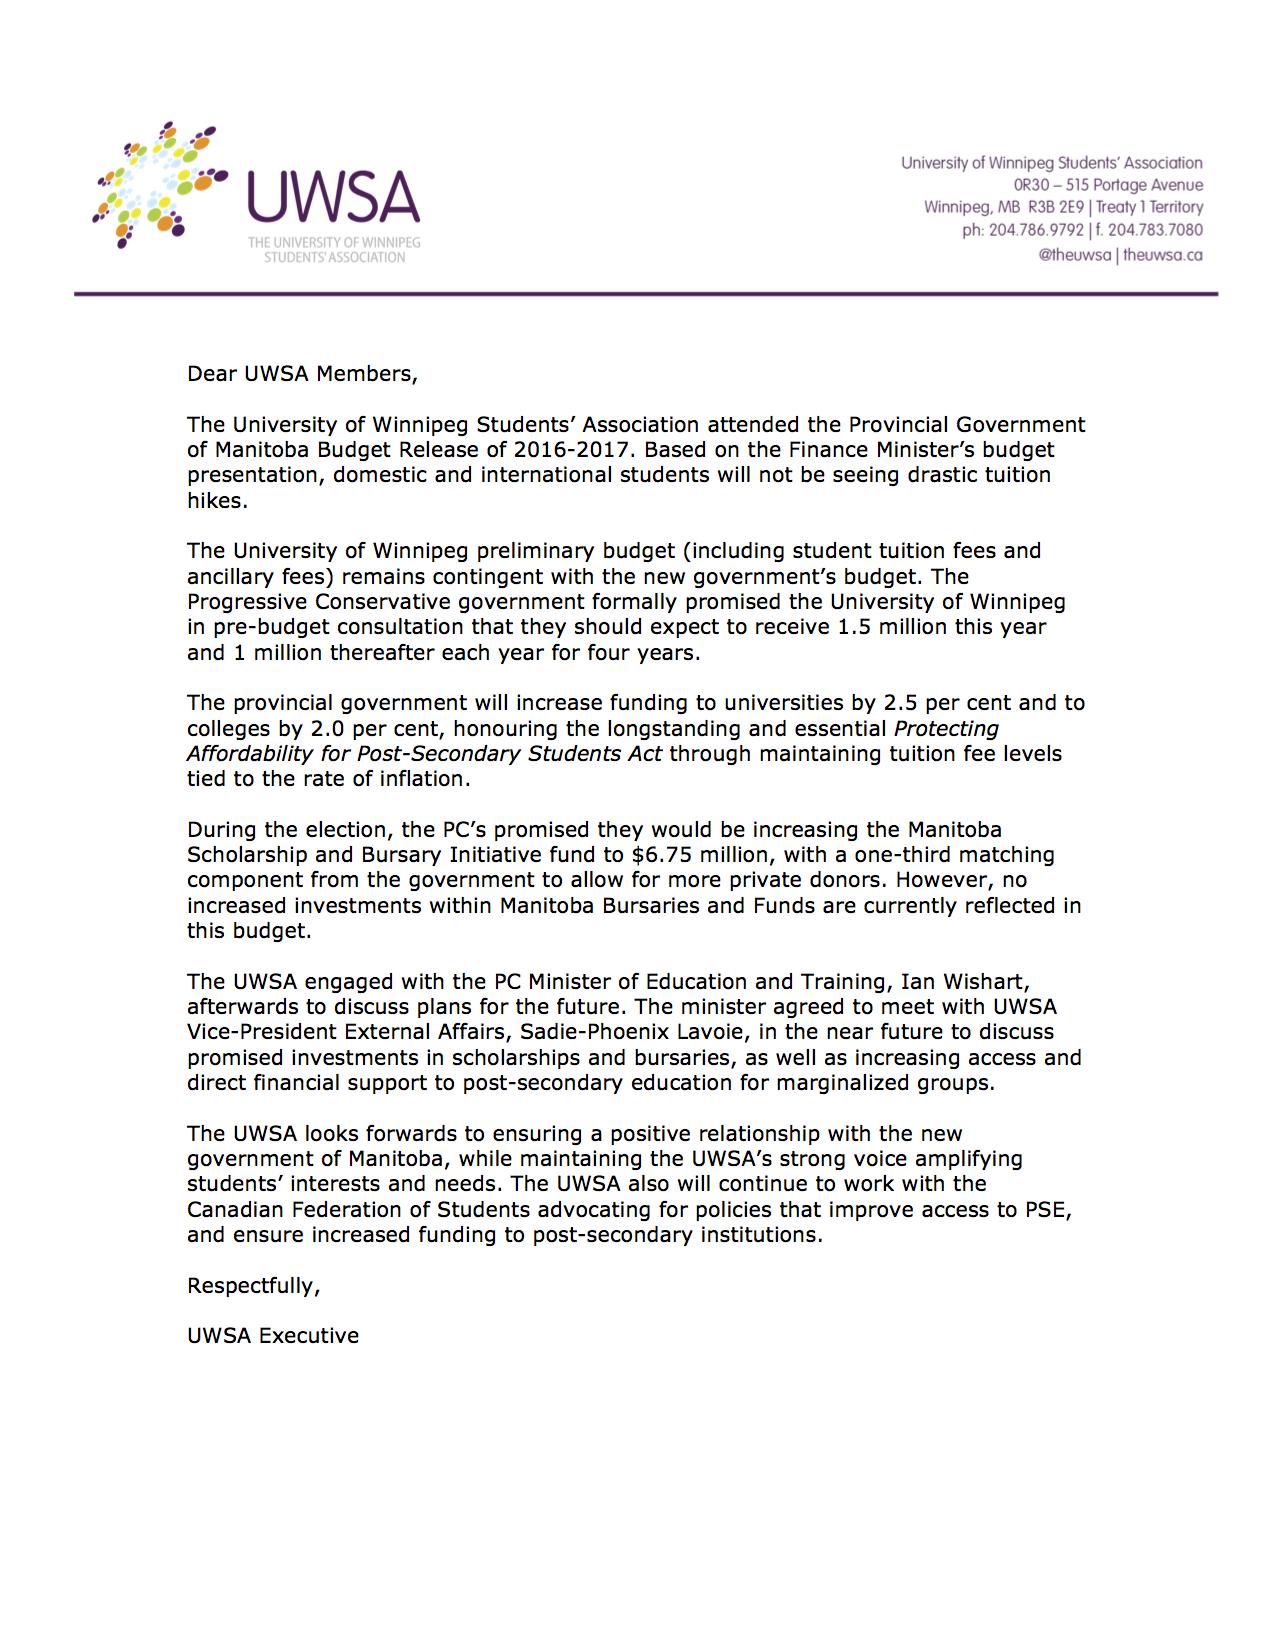 UWSA Budget Members Statement